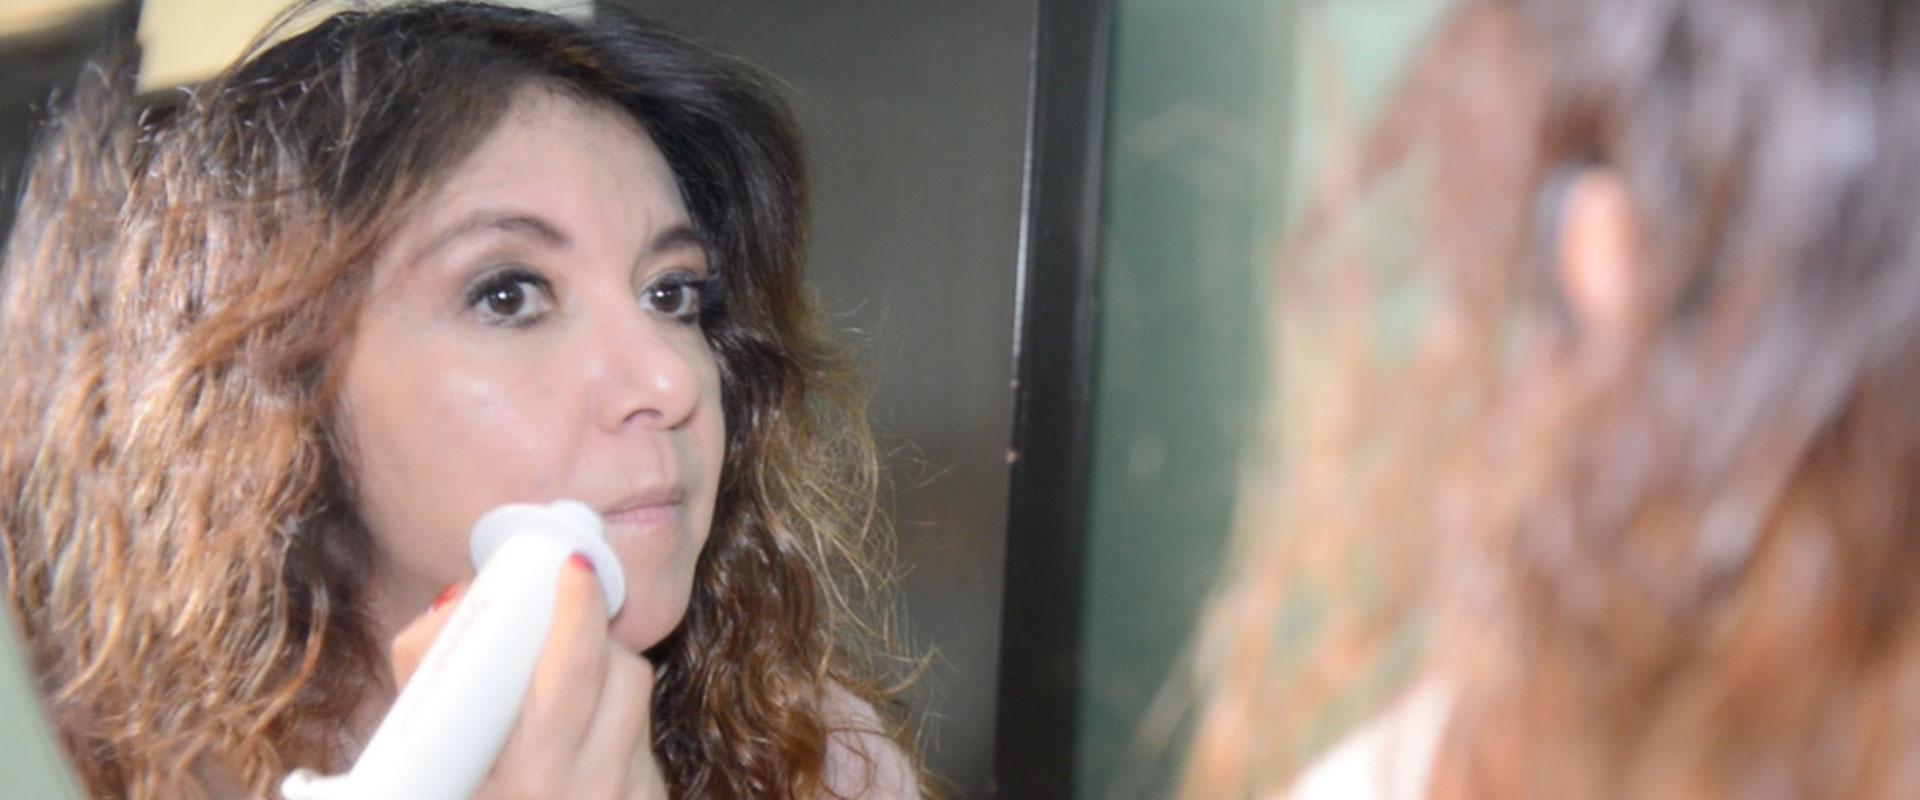 Mujer usando su DermaWand frente al espejo.